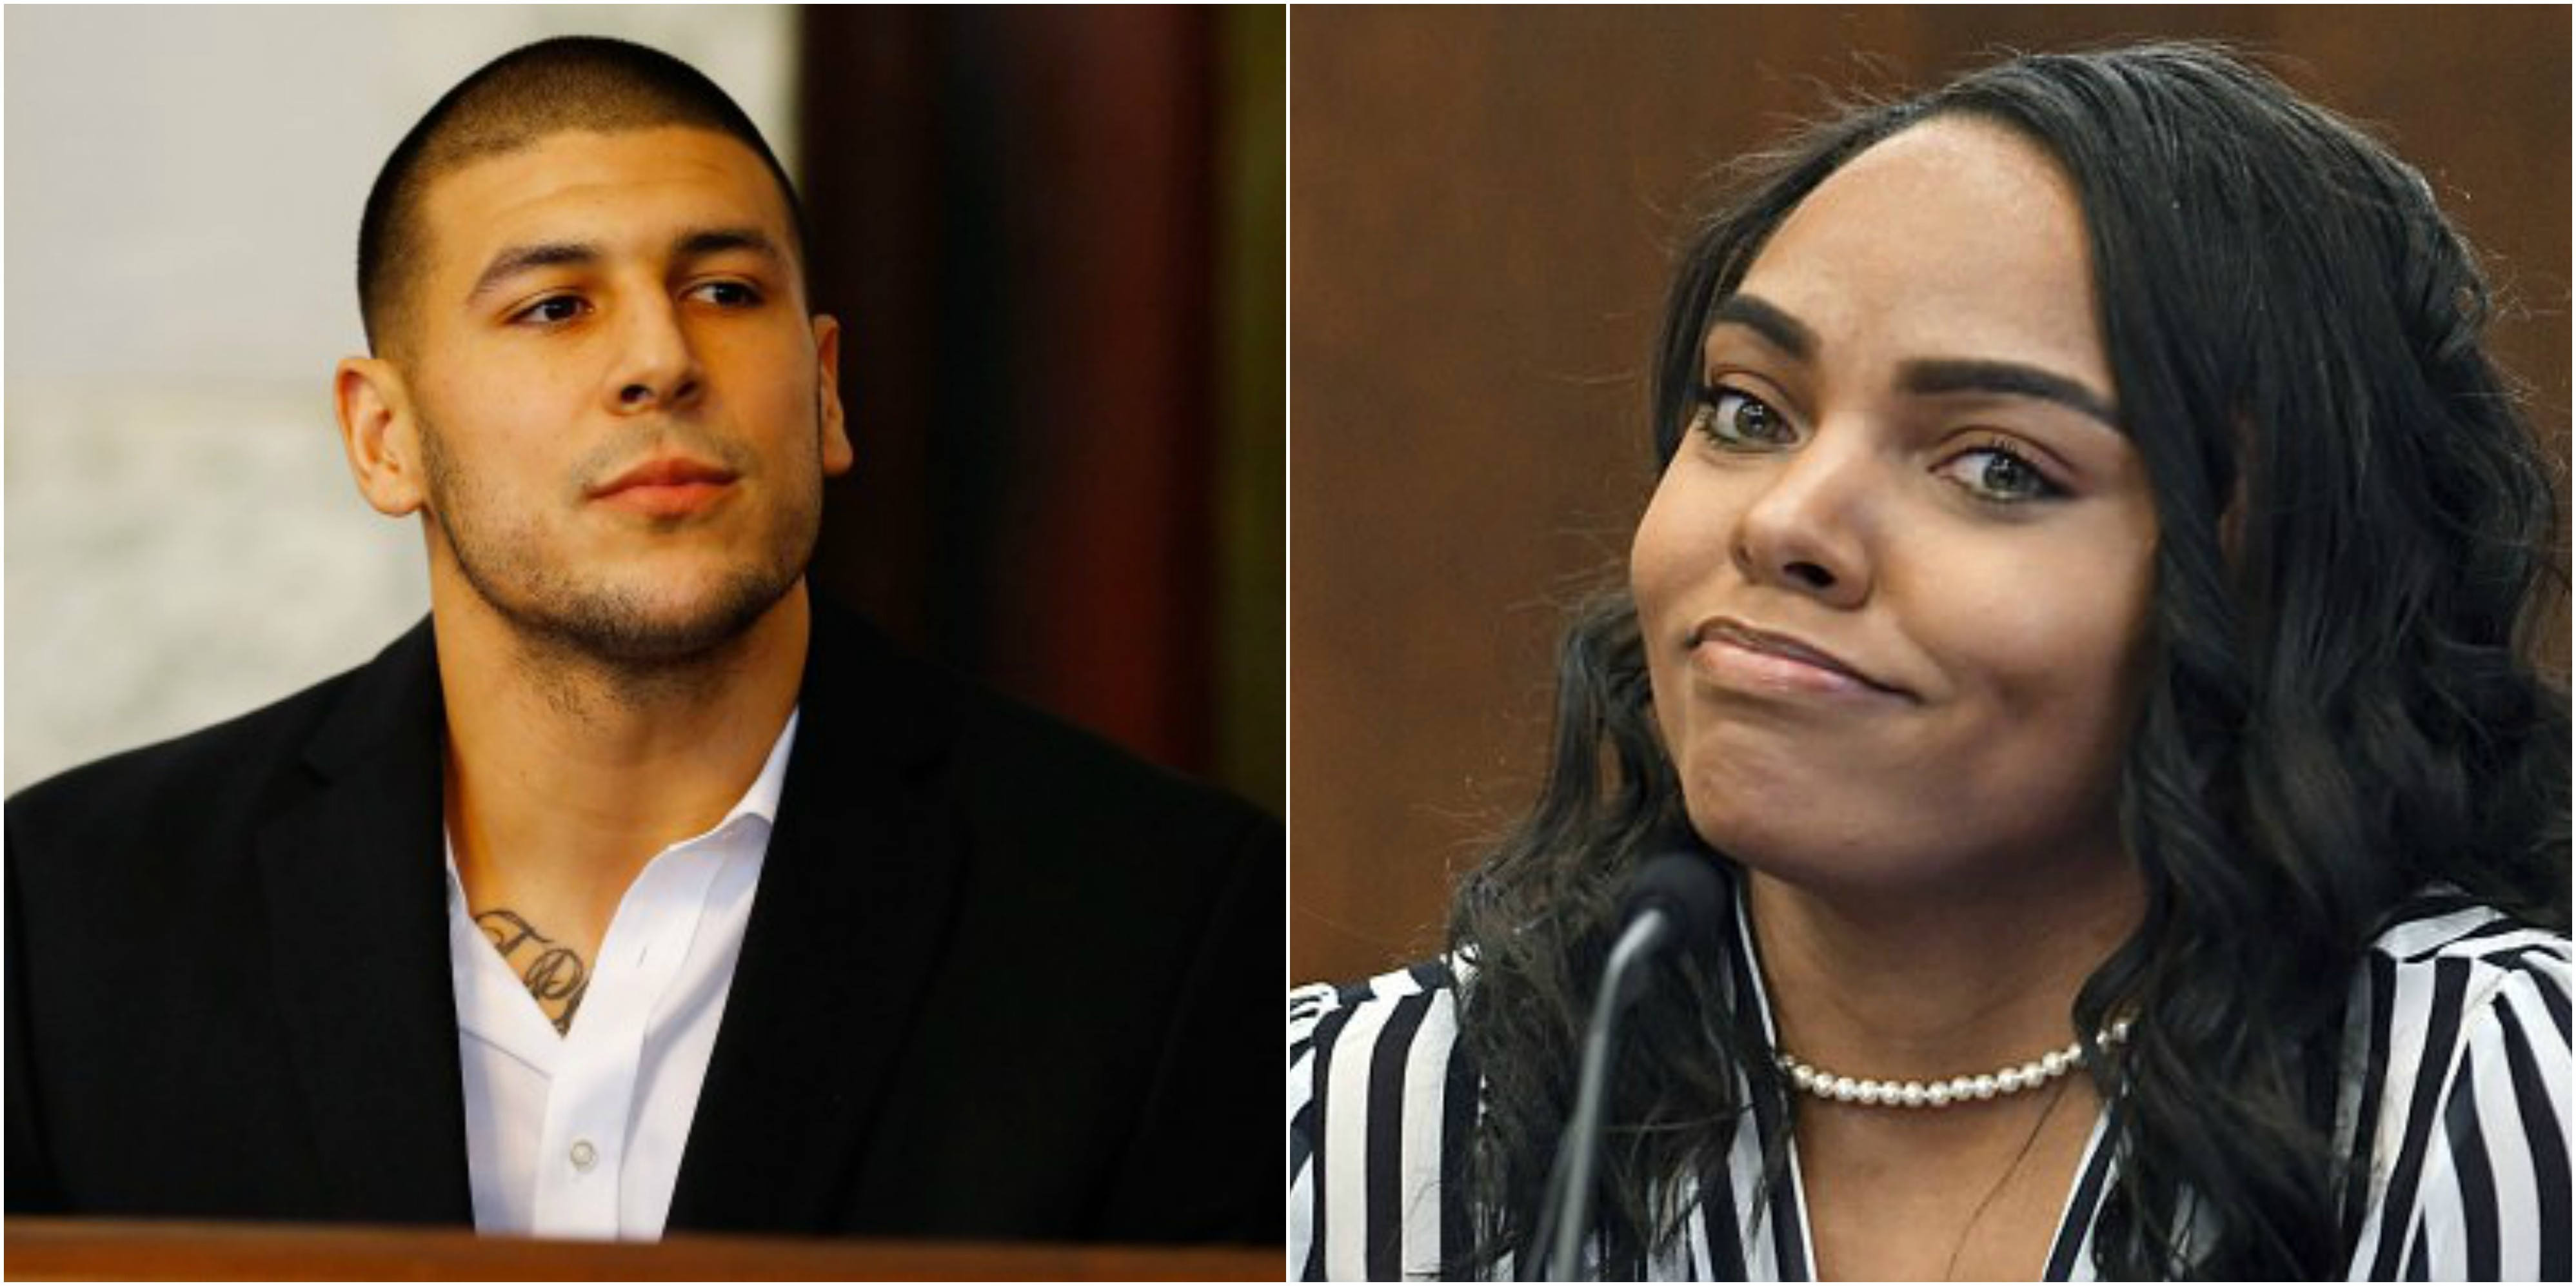 Shayanna Jenkins to testify against Aaron Hernandez